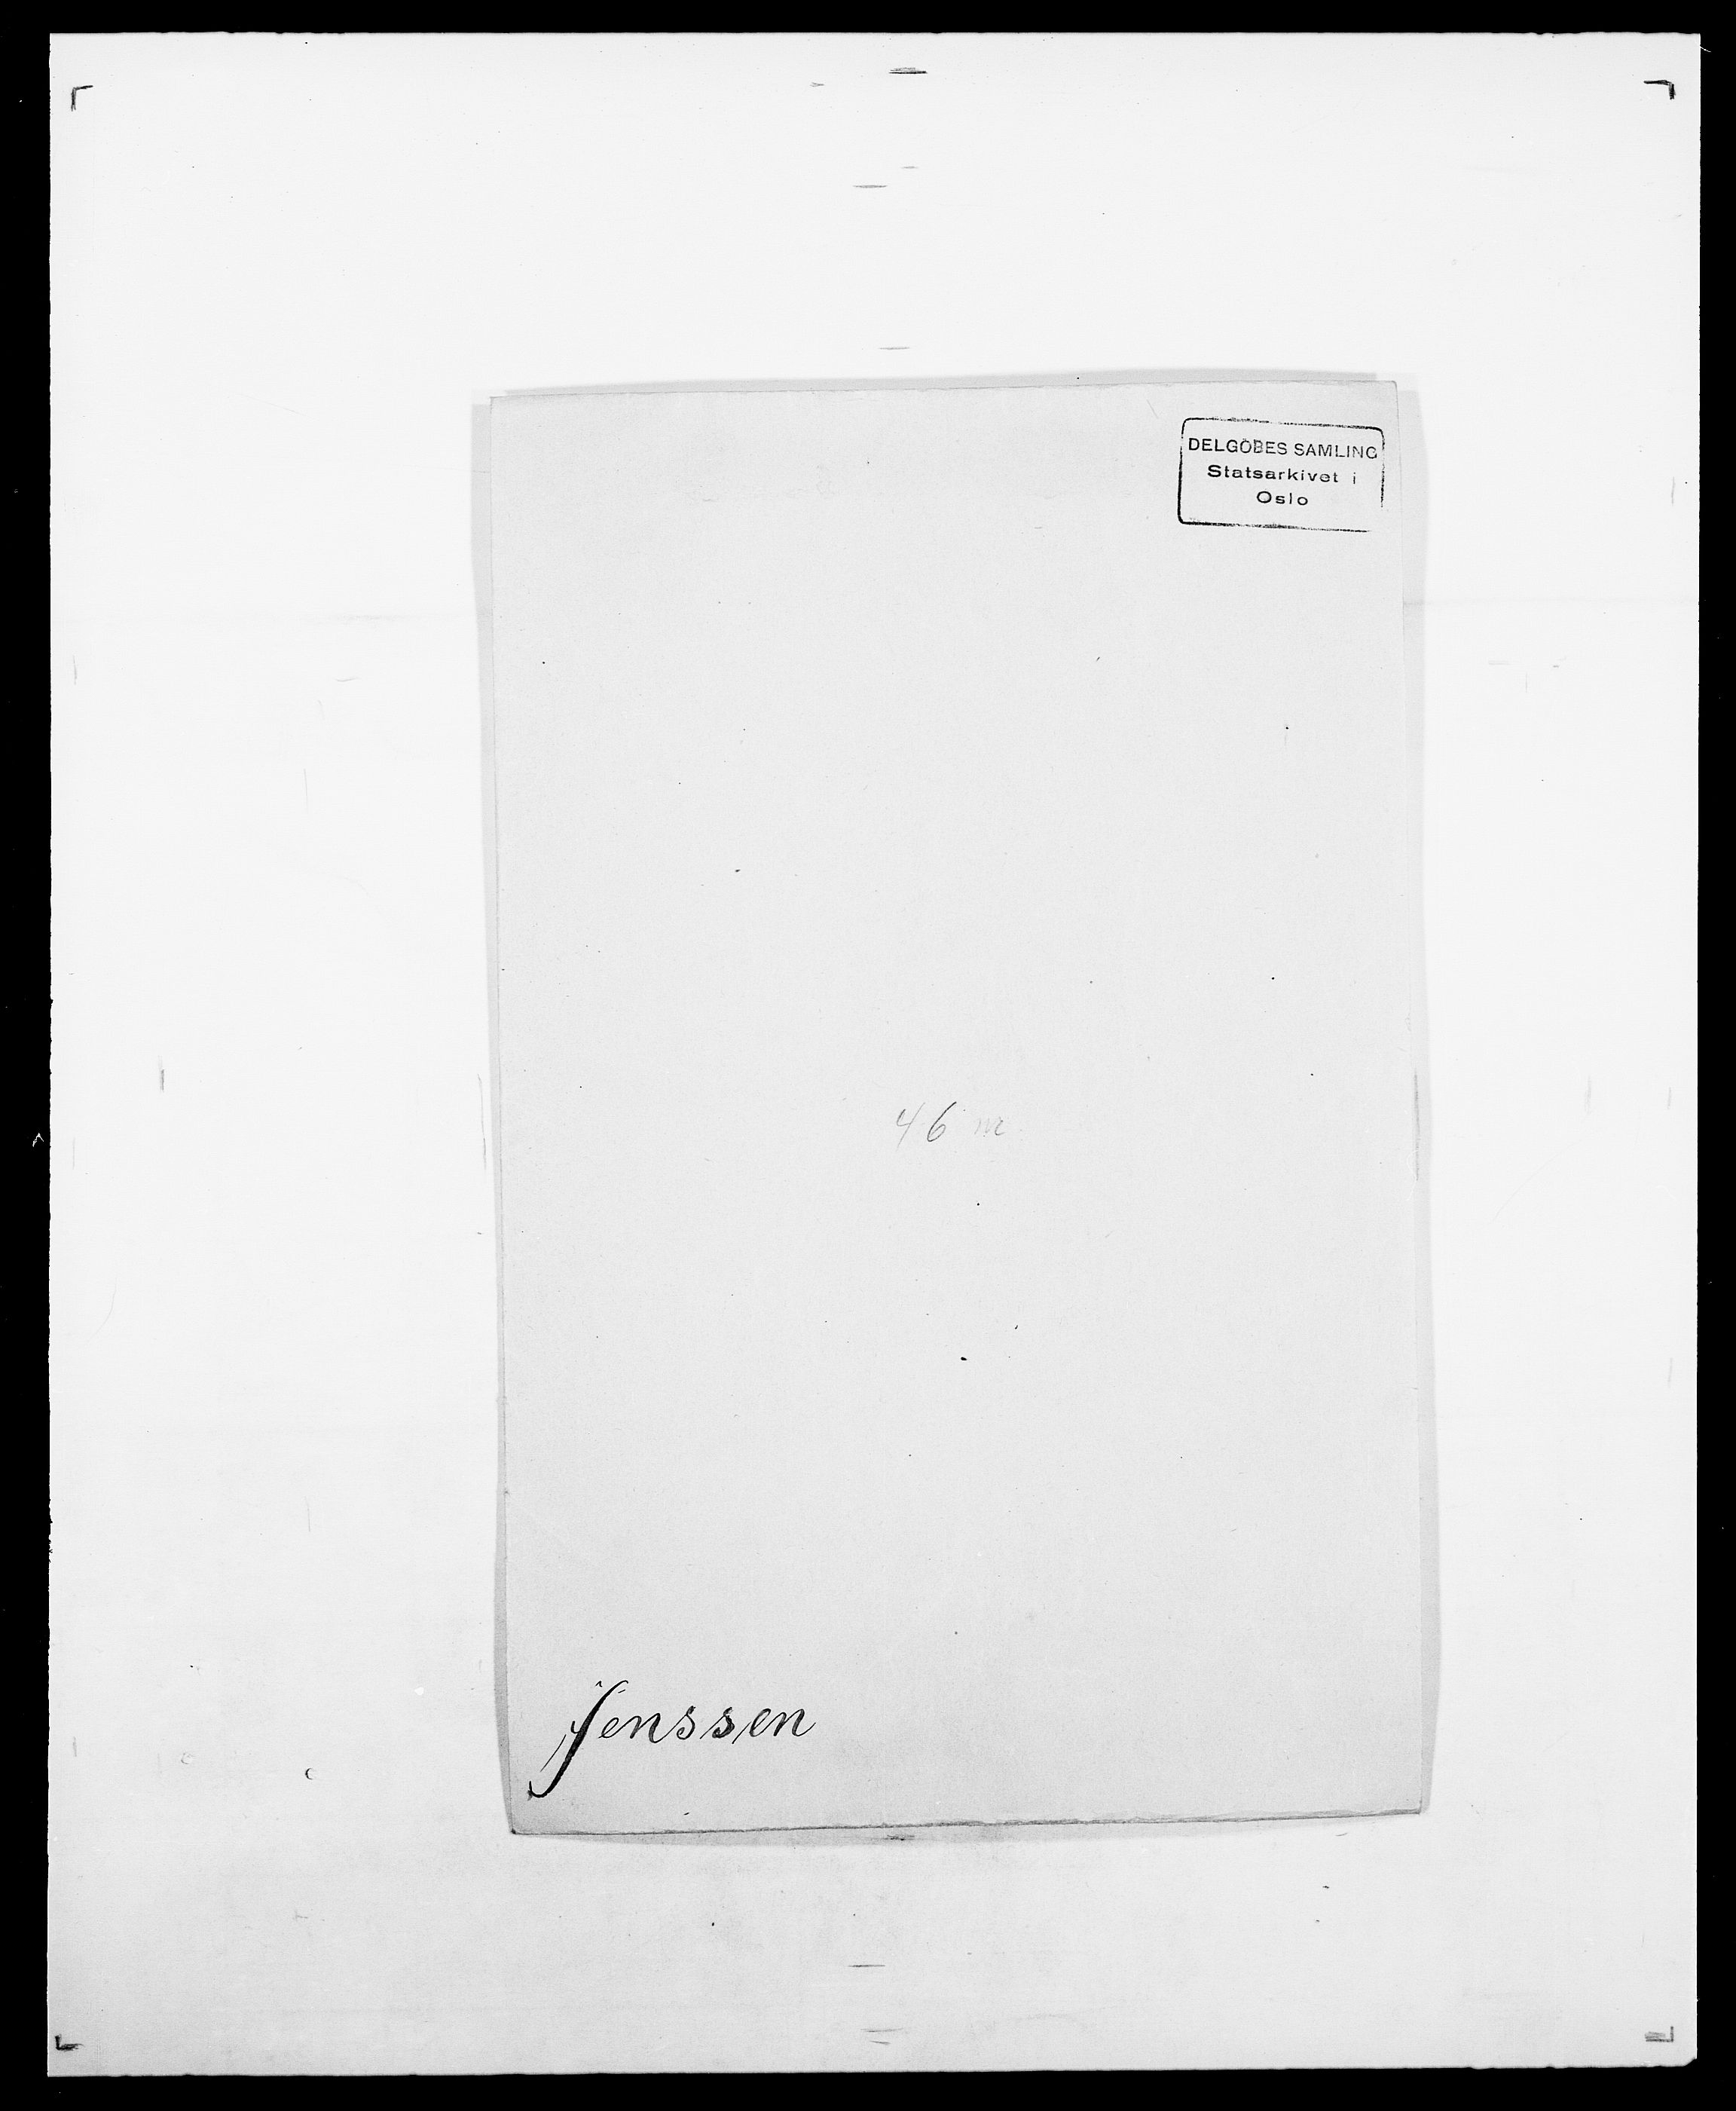 SAO, Delgobe, Charles Antoine - samling, D/Da/L0019: van der Hude - Joys, s. 637